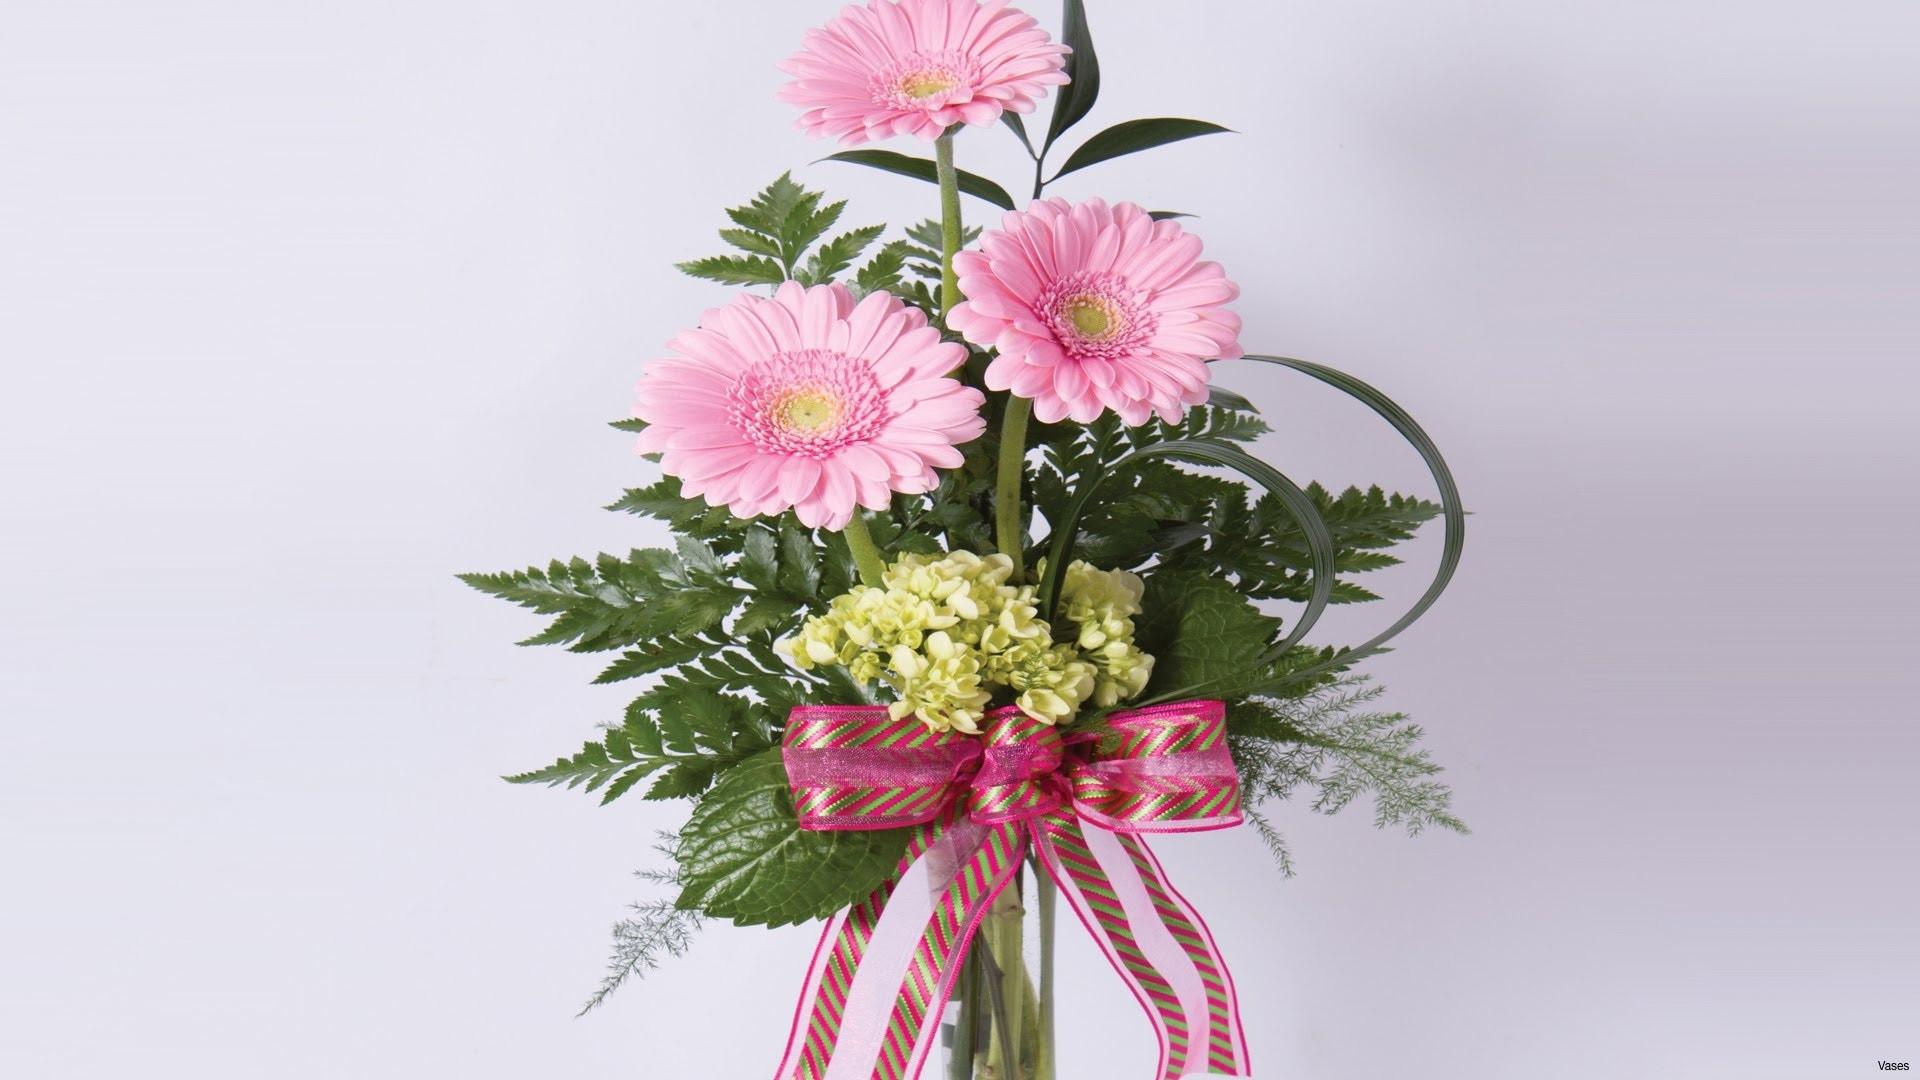 Headstone Vase Flower Arrangements Of 27 Beautiful Flower Vase Definition Flower Decoration Ideas within Flower Vase Definition Best Of 36 Beautiful Picture Arrangements